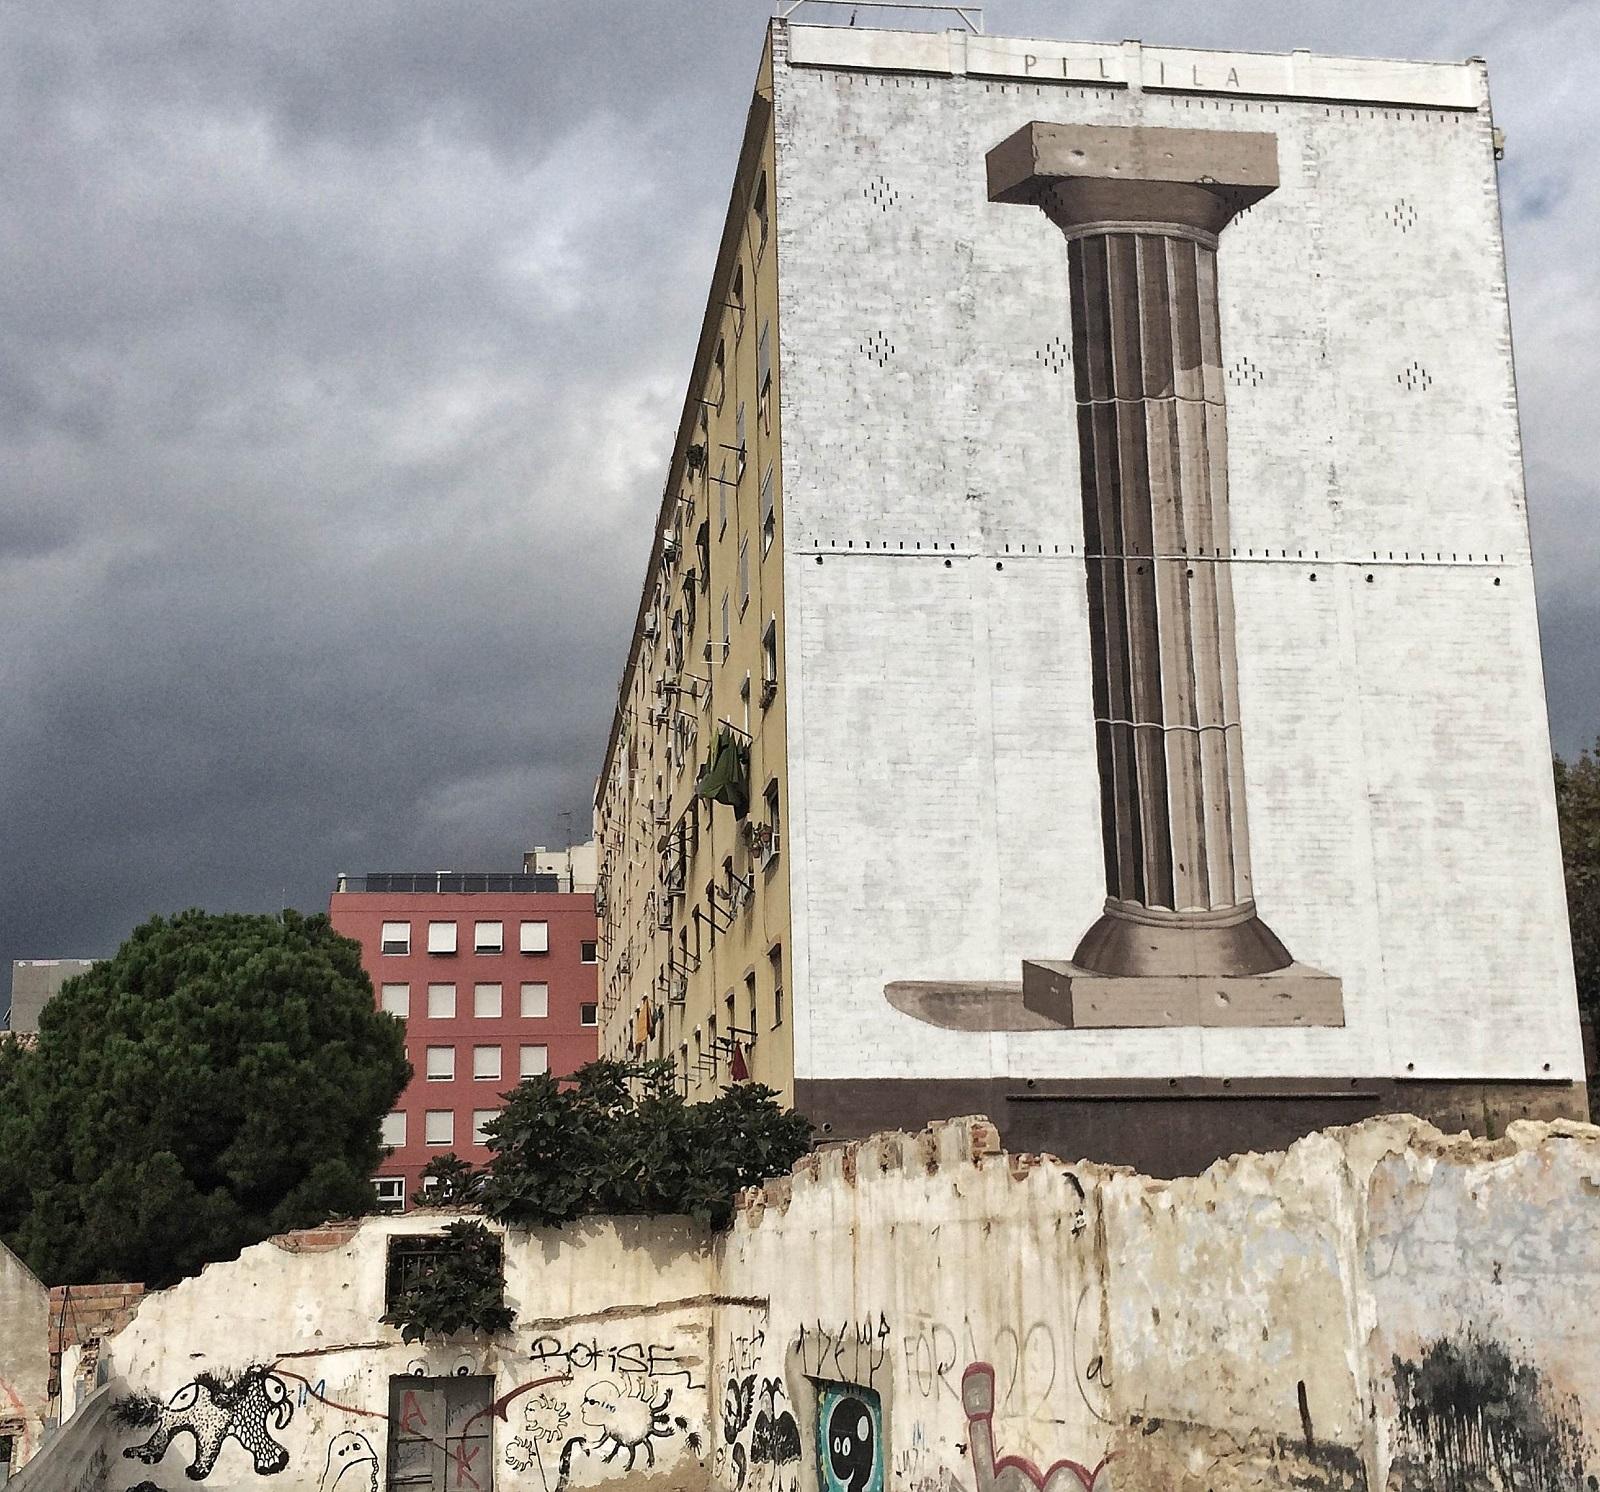 escif-new-mural-for-openwalls-barcelona-04